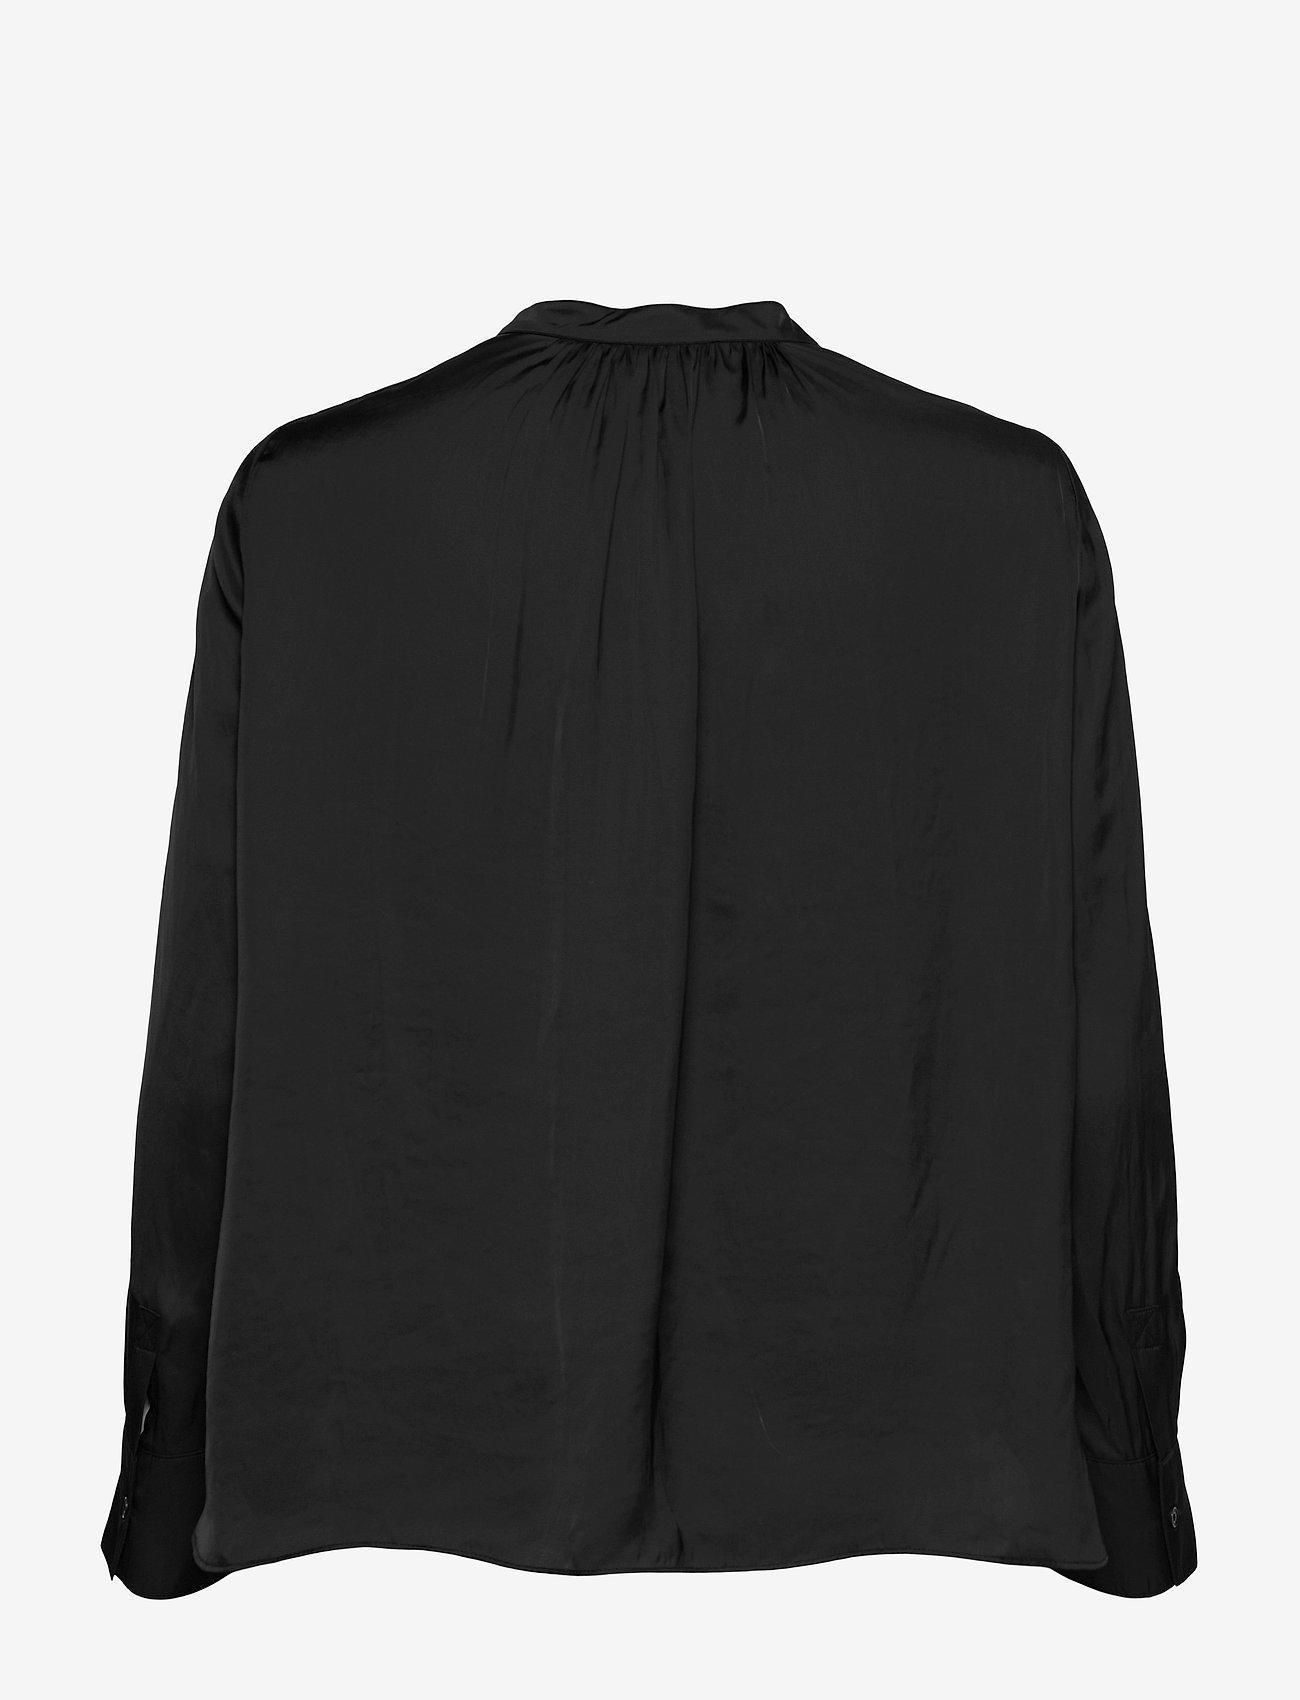 Zadig & Voltaire - TINK SATIN TUNIC BLOUSE PERMANENT - langærmede bluser - black - 1